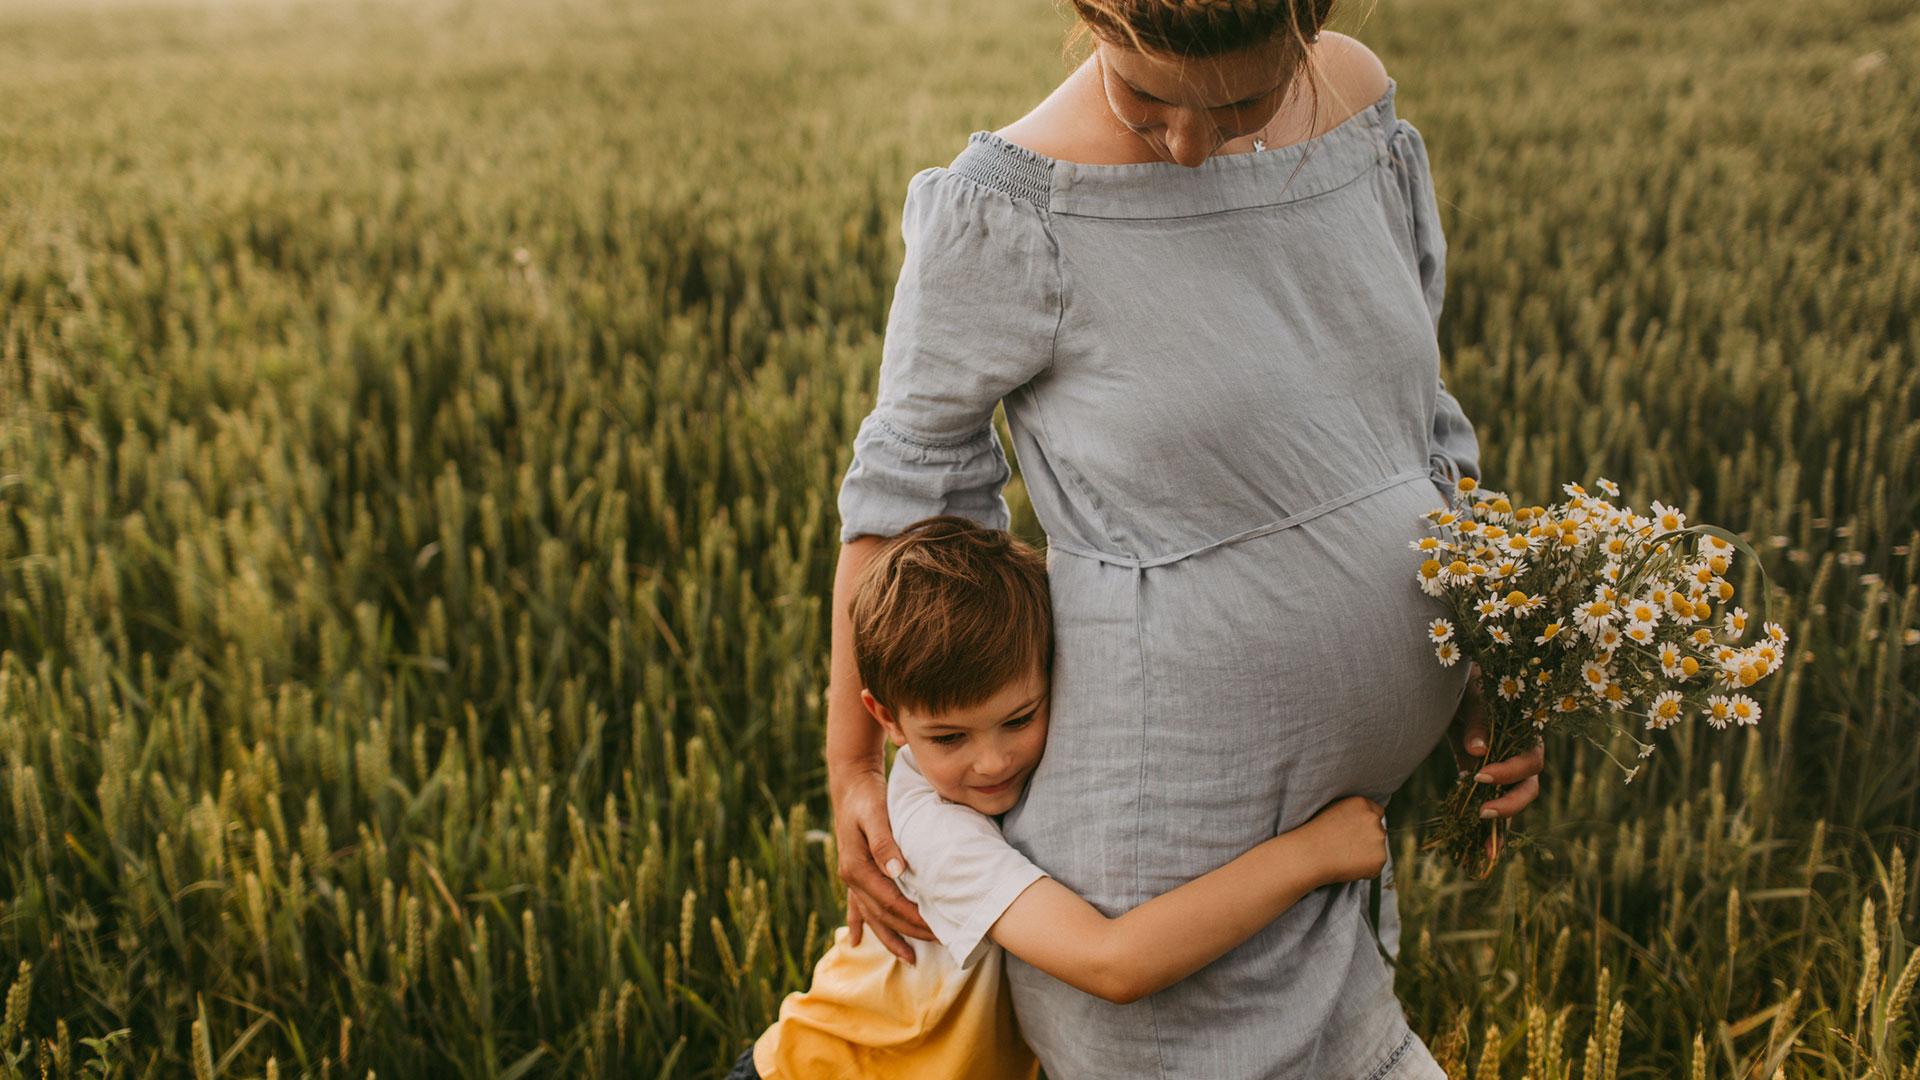 Pregnancy, Fertility and Childbirth